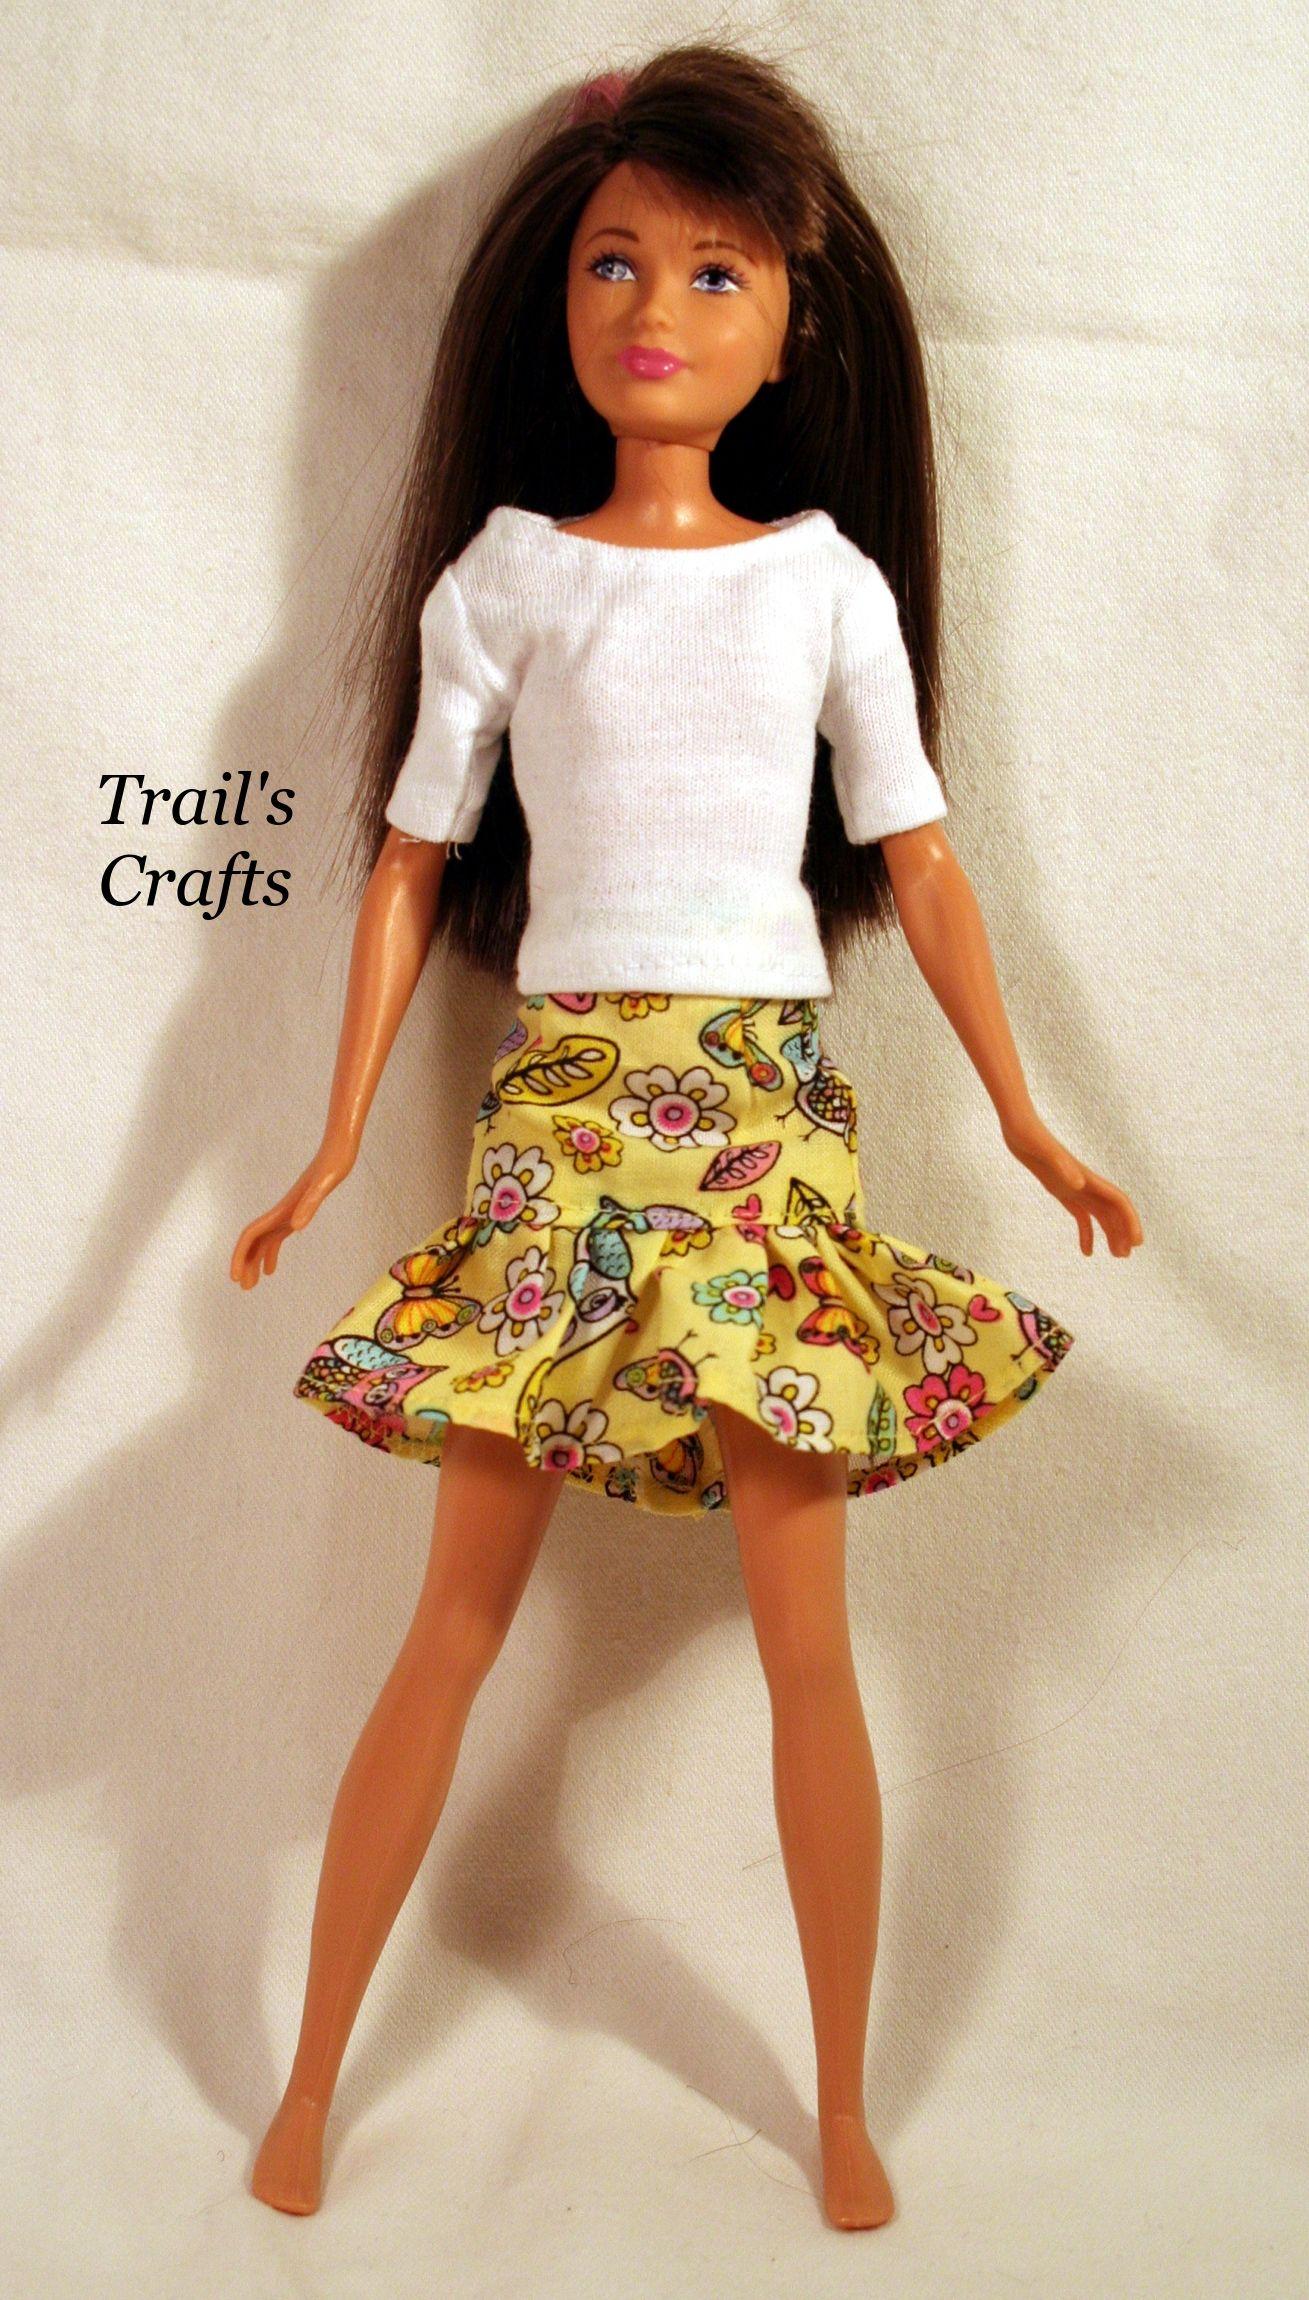 modest barbie dolls clothing templates | New Handmade Dress For ...